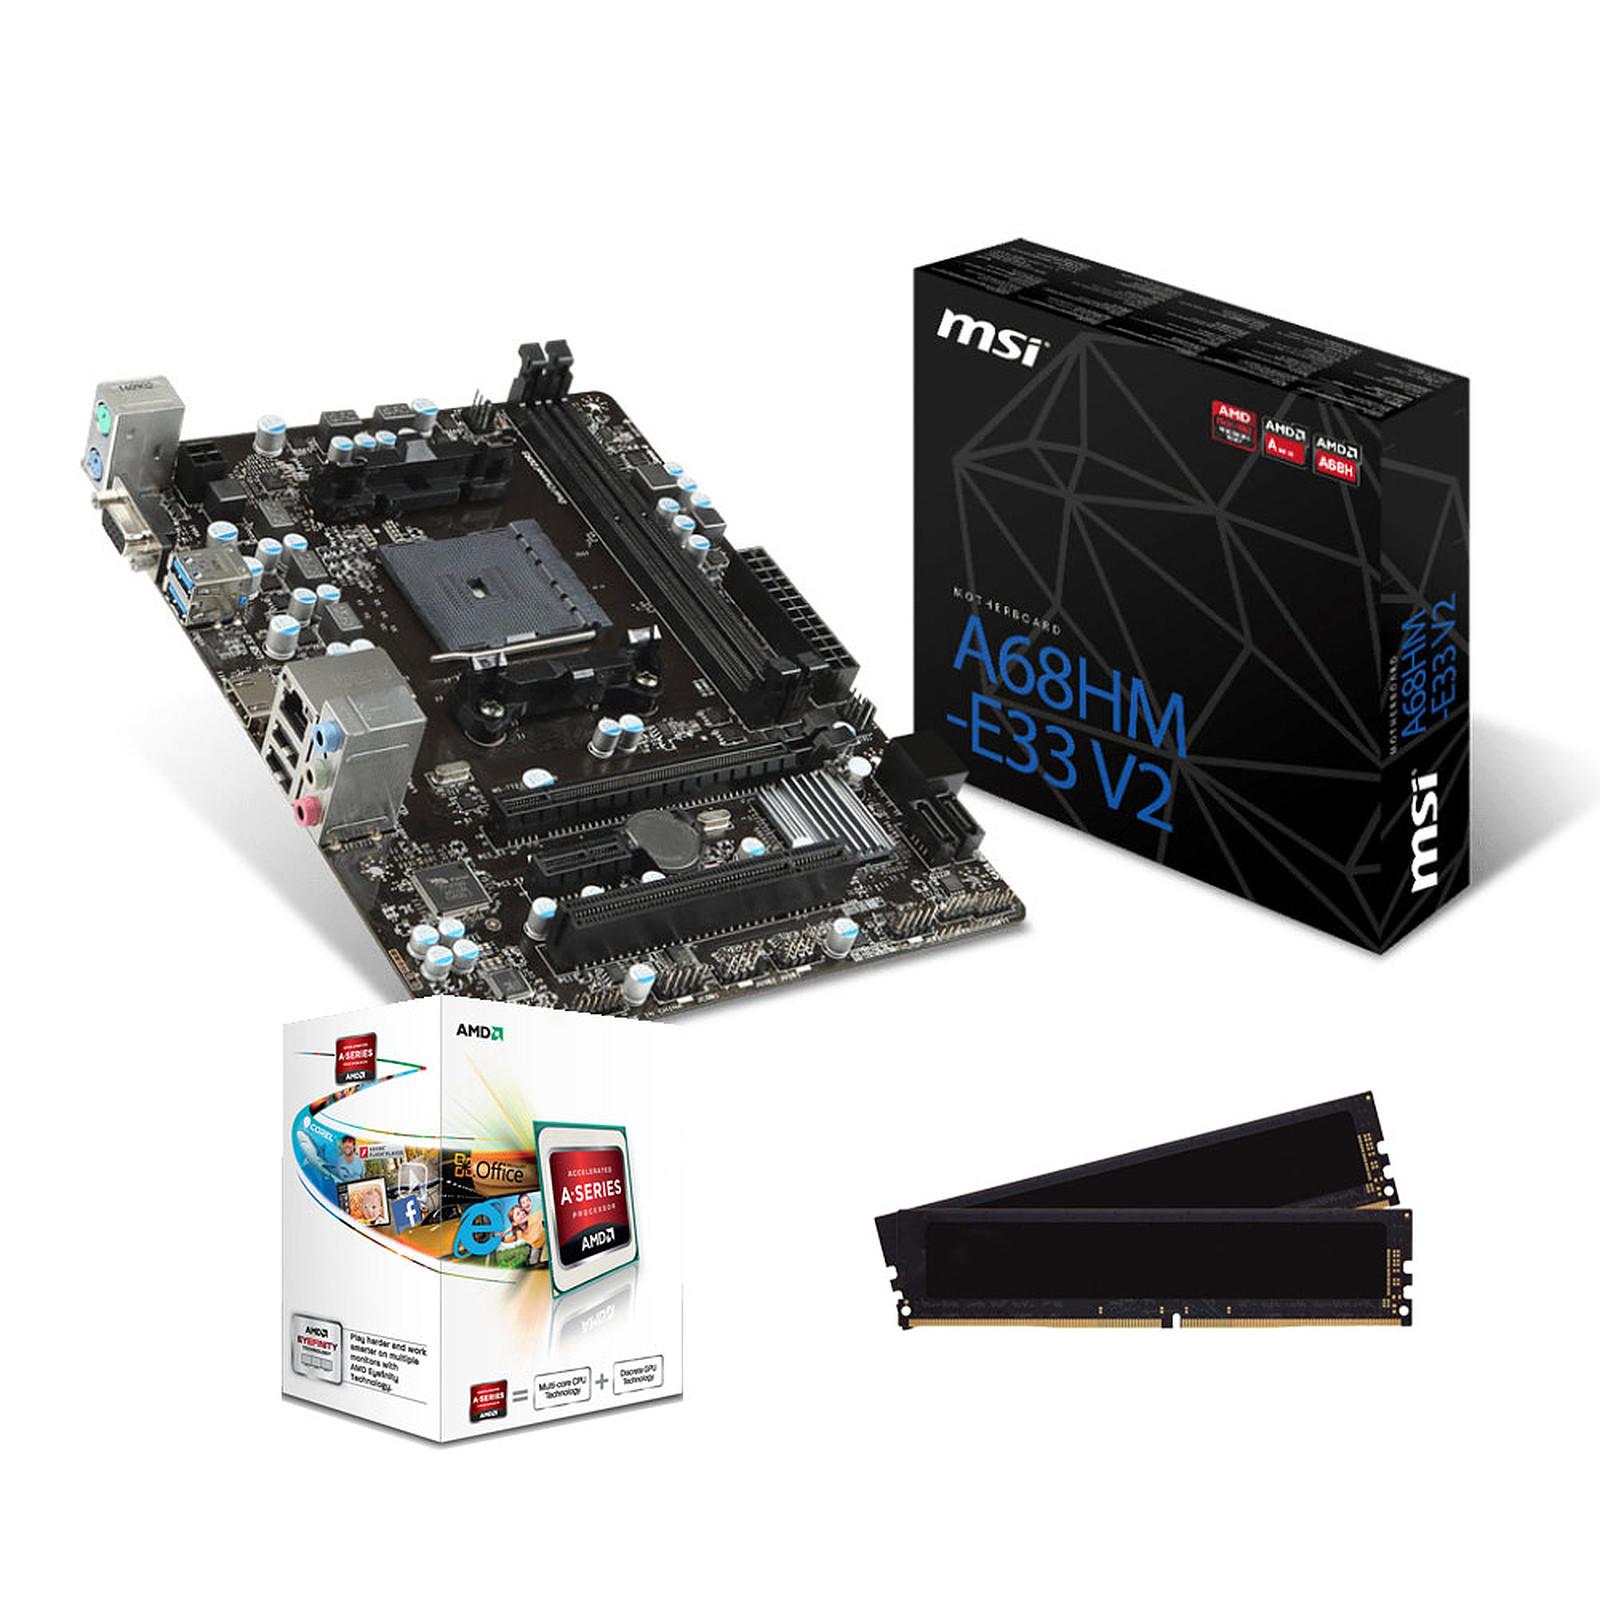 Kit Upgrade PC AMD A4 MSI A68HM-E33 V2 8 Go